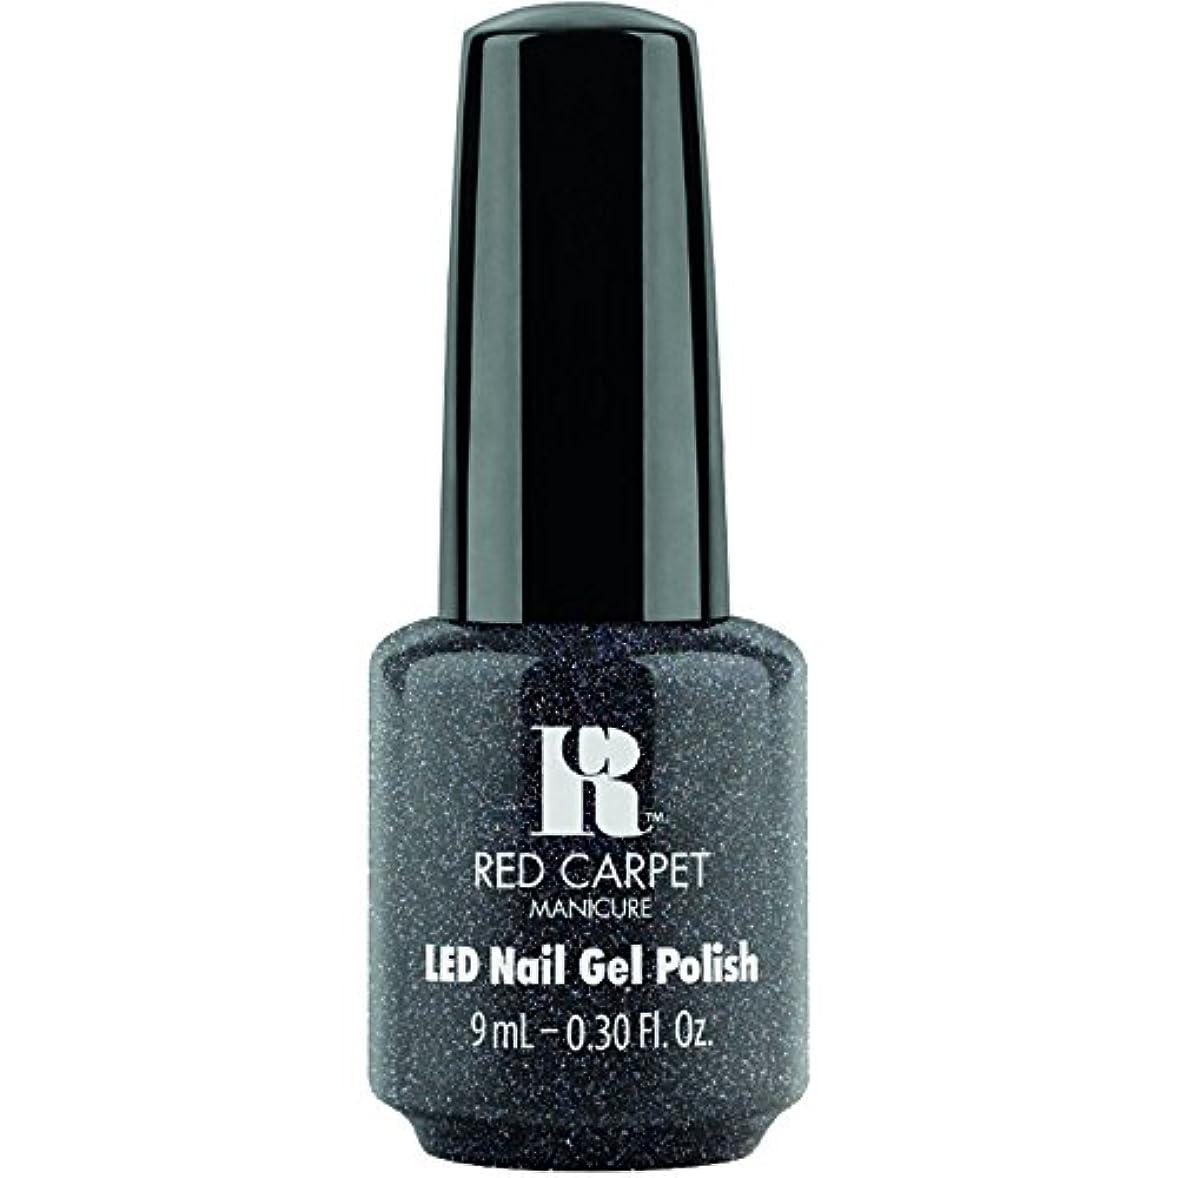 Red Carpet Manicure - LED Nail Gel Polish - Star Gazer - 0.3oz / 9ml